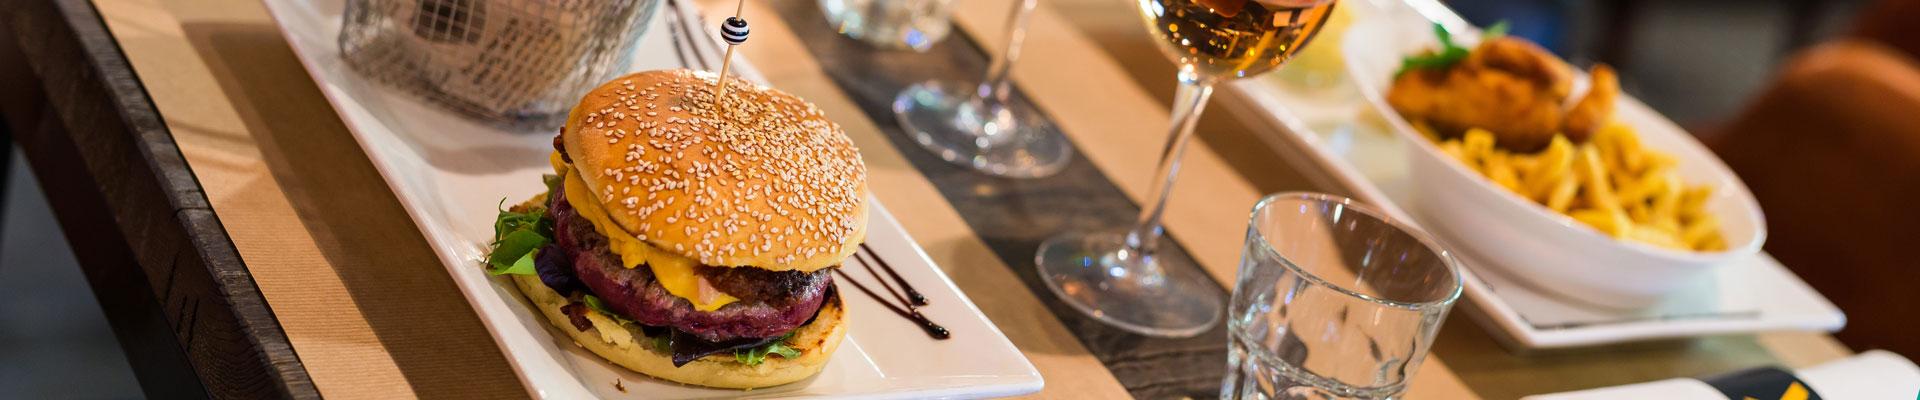 la-fabrik-steakhouse-food-&-drink-restaurant-bar-hangar-quai-rouen-seine-42-bandeau-burger-1920×400